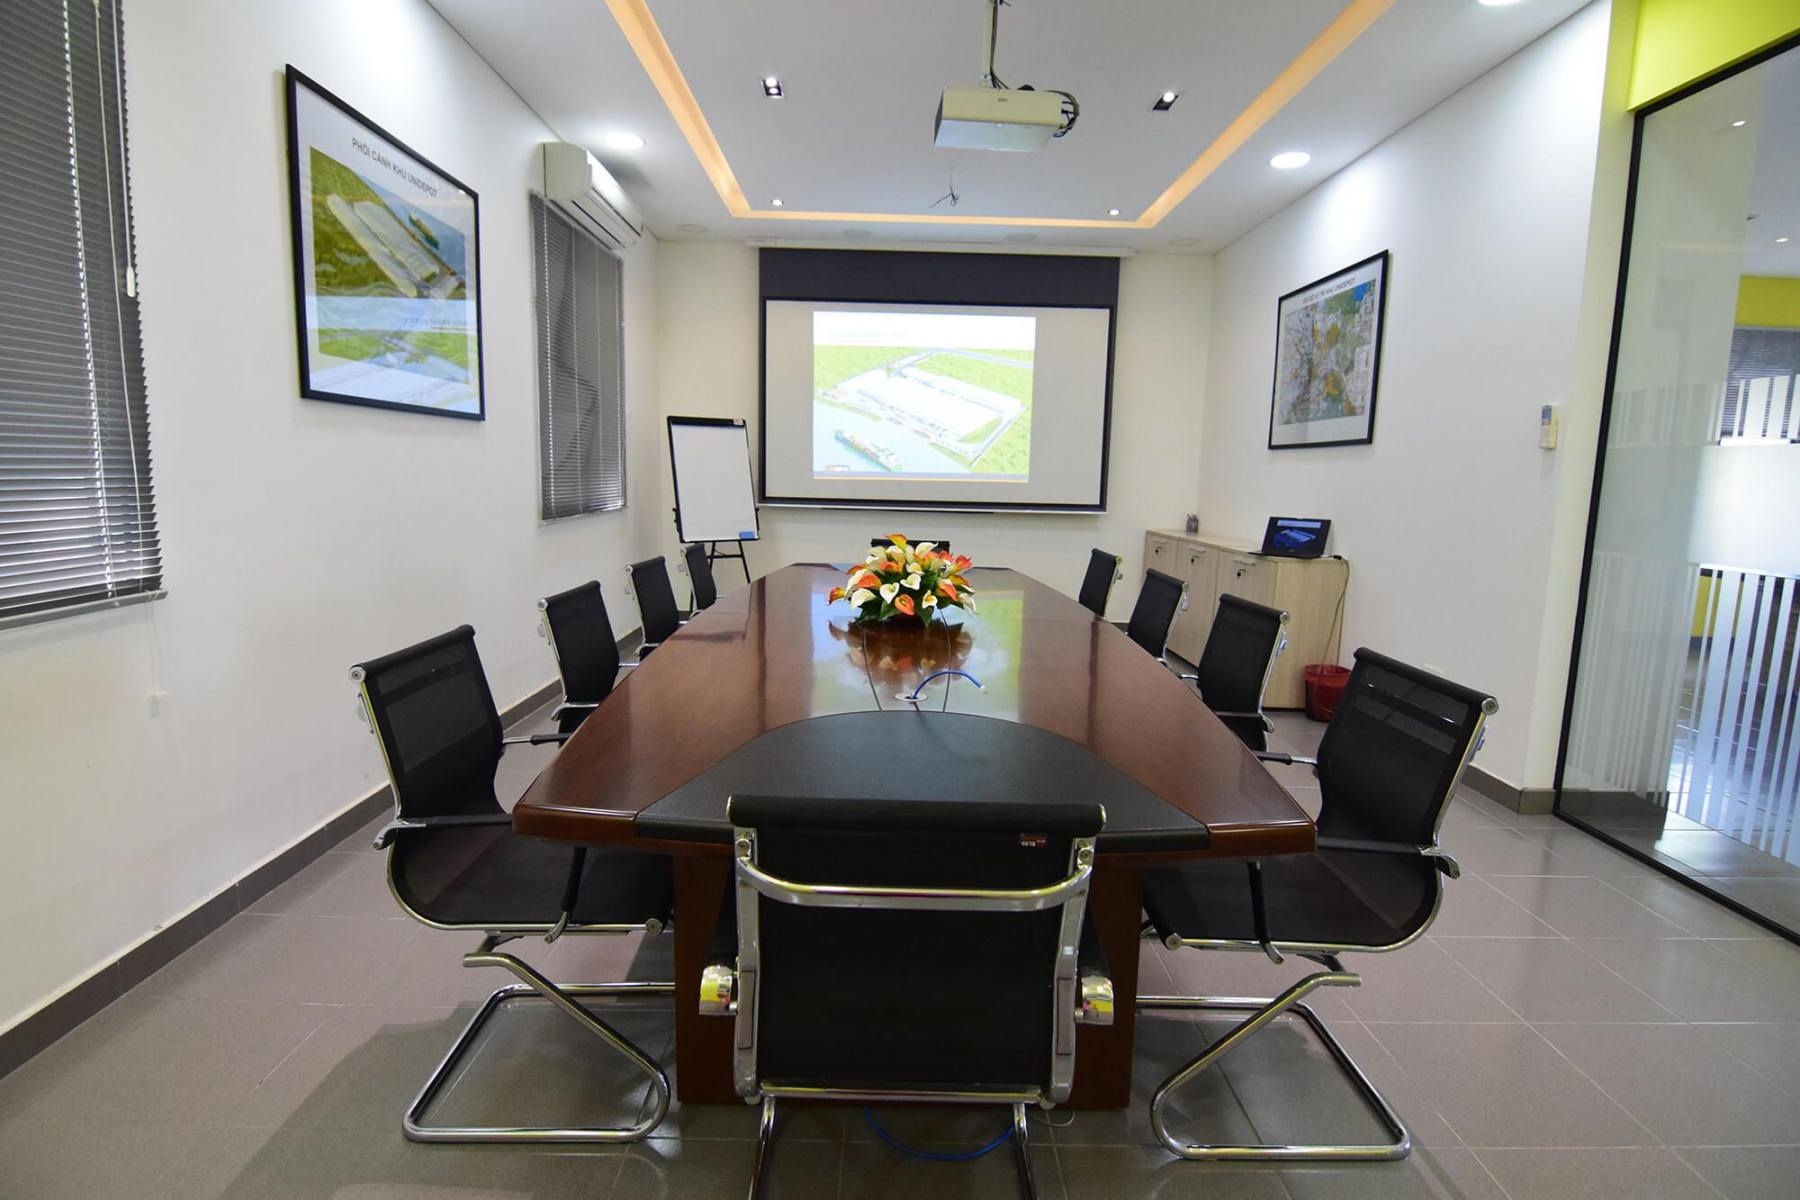 Unidepot-Public-Meeting-room